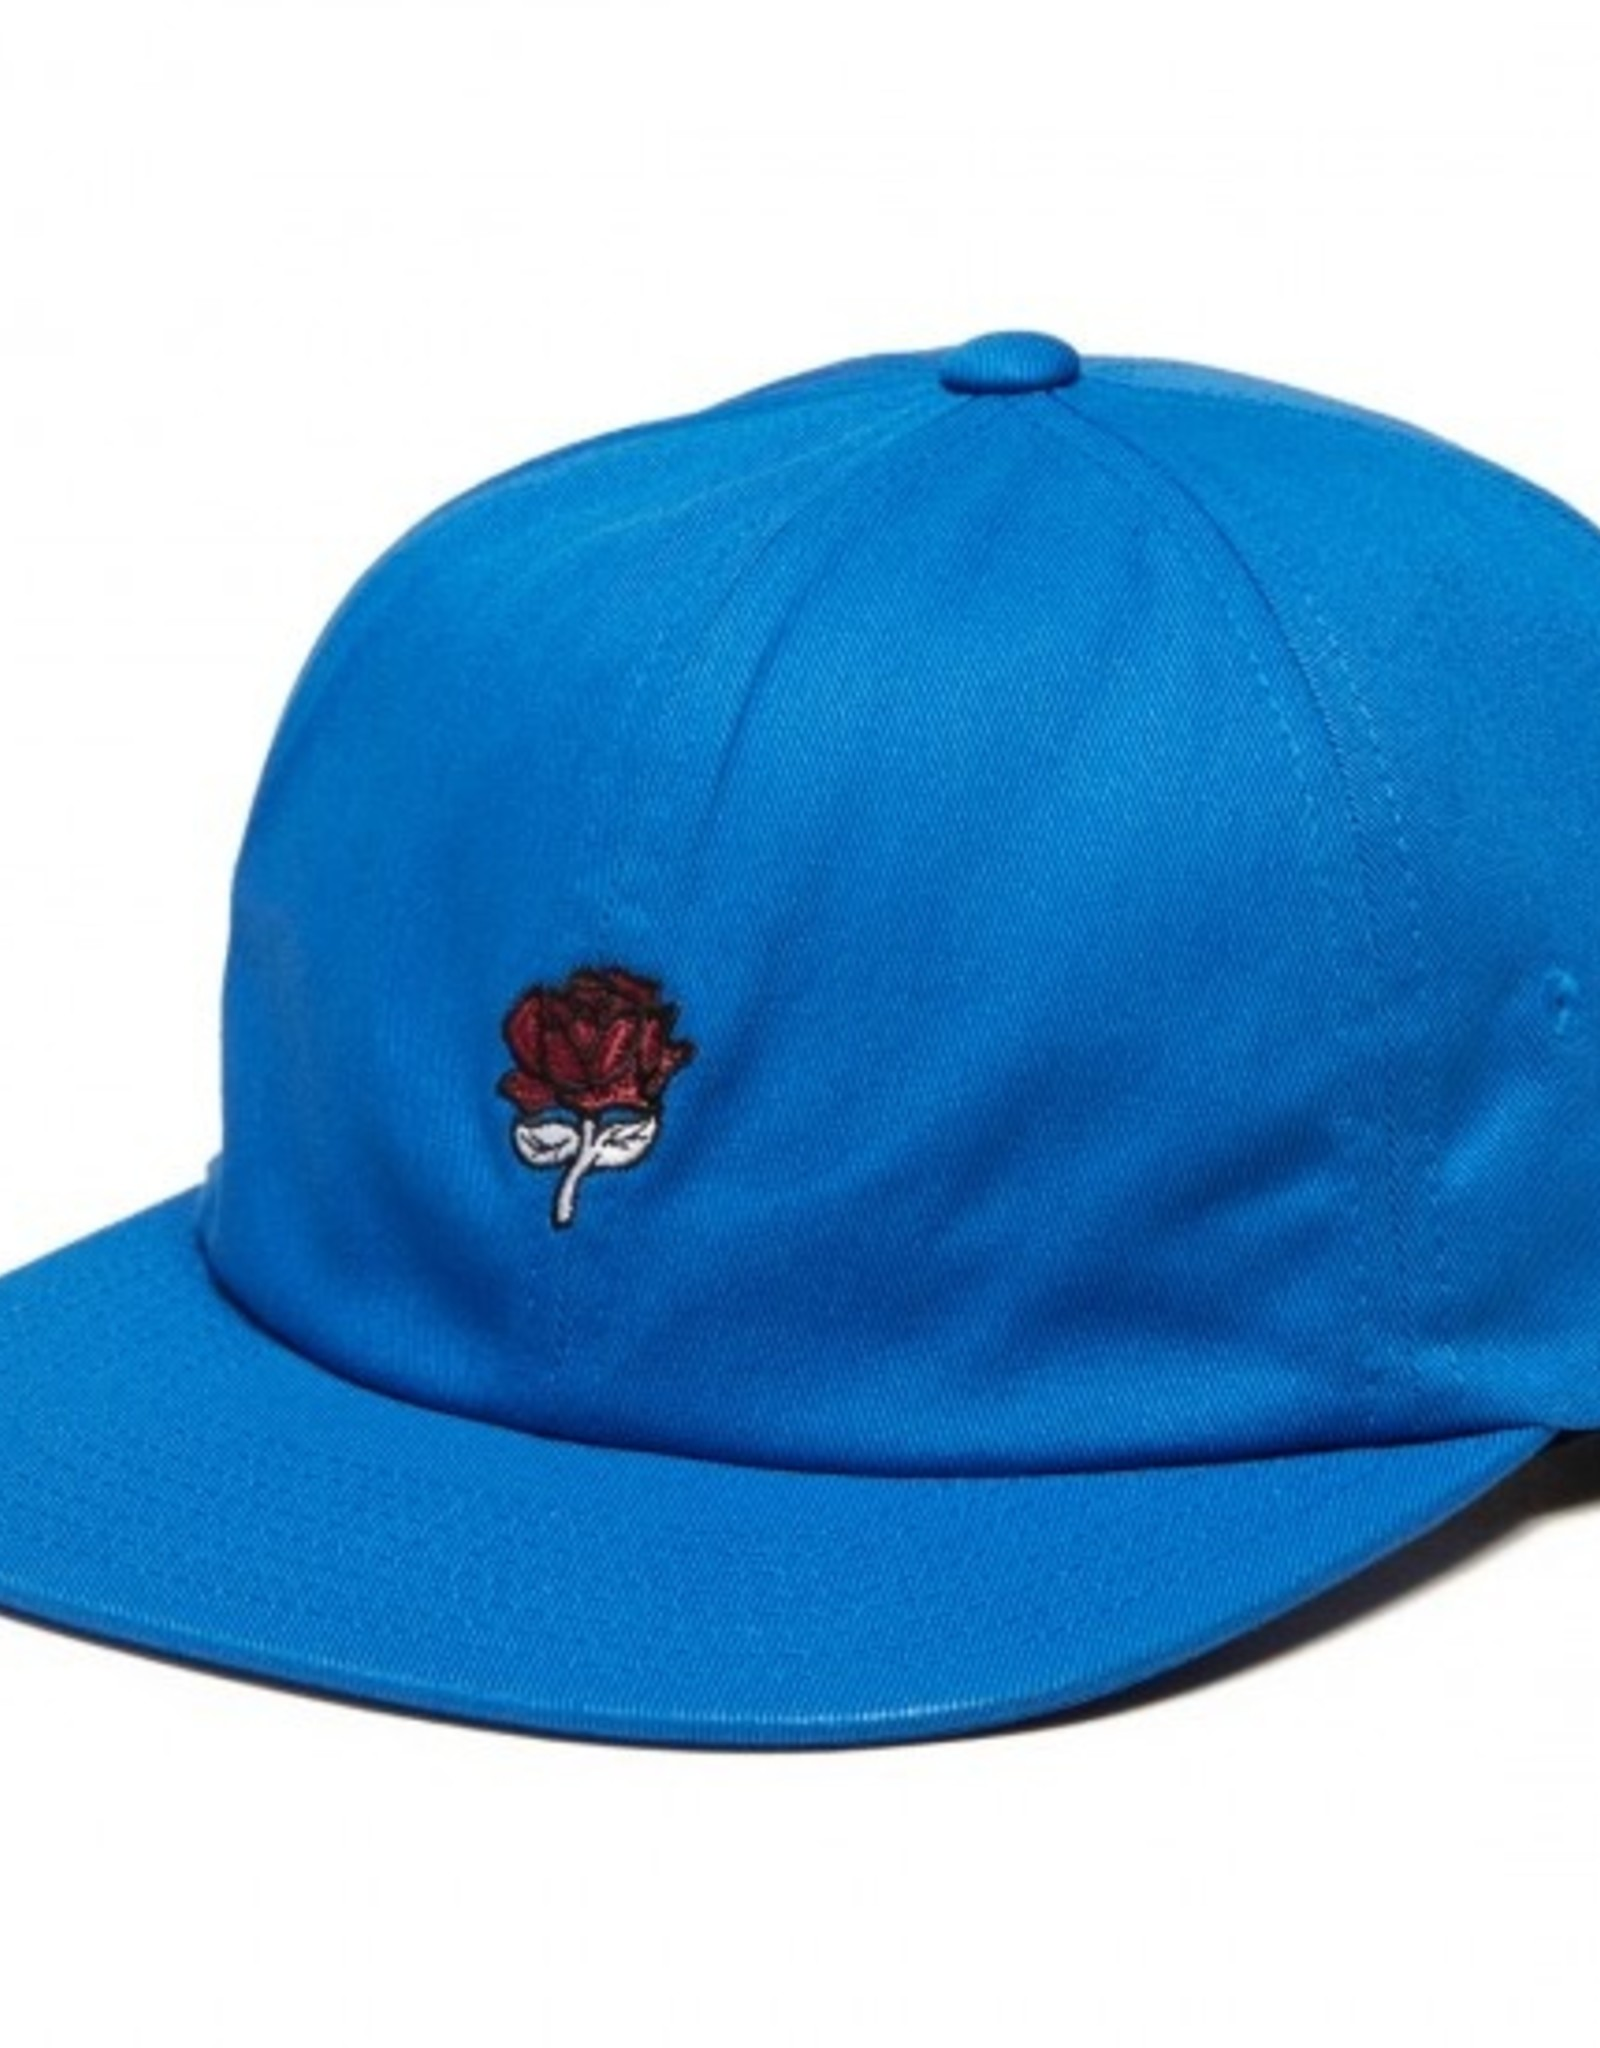 VANS 66 CHAMPS JOCKEY HAT - DRESS BLUE